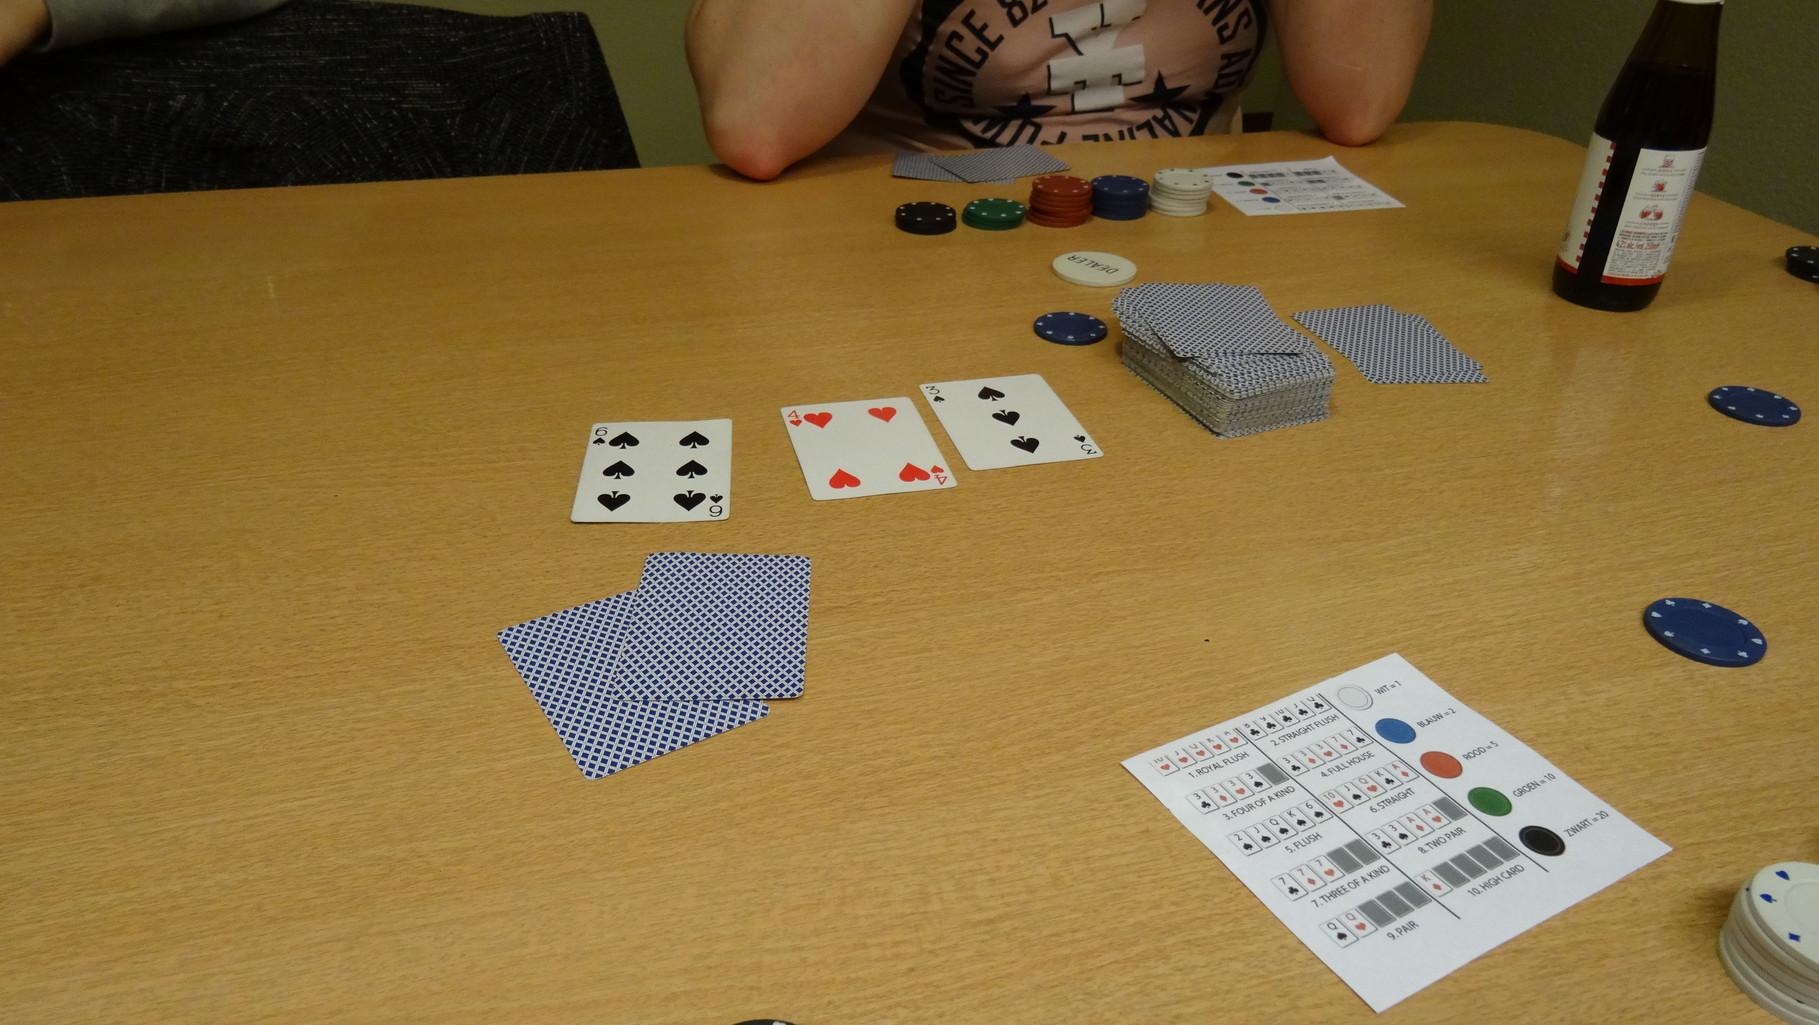 Pokeren